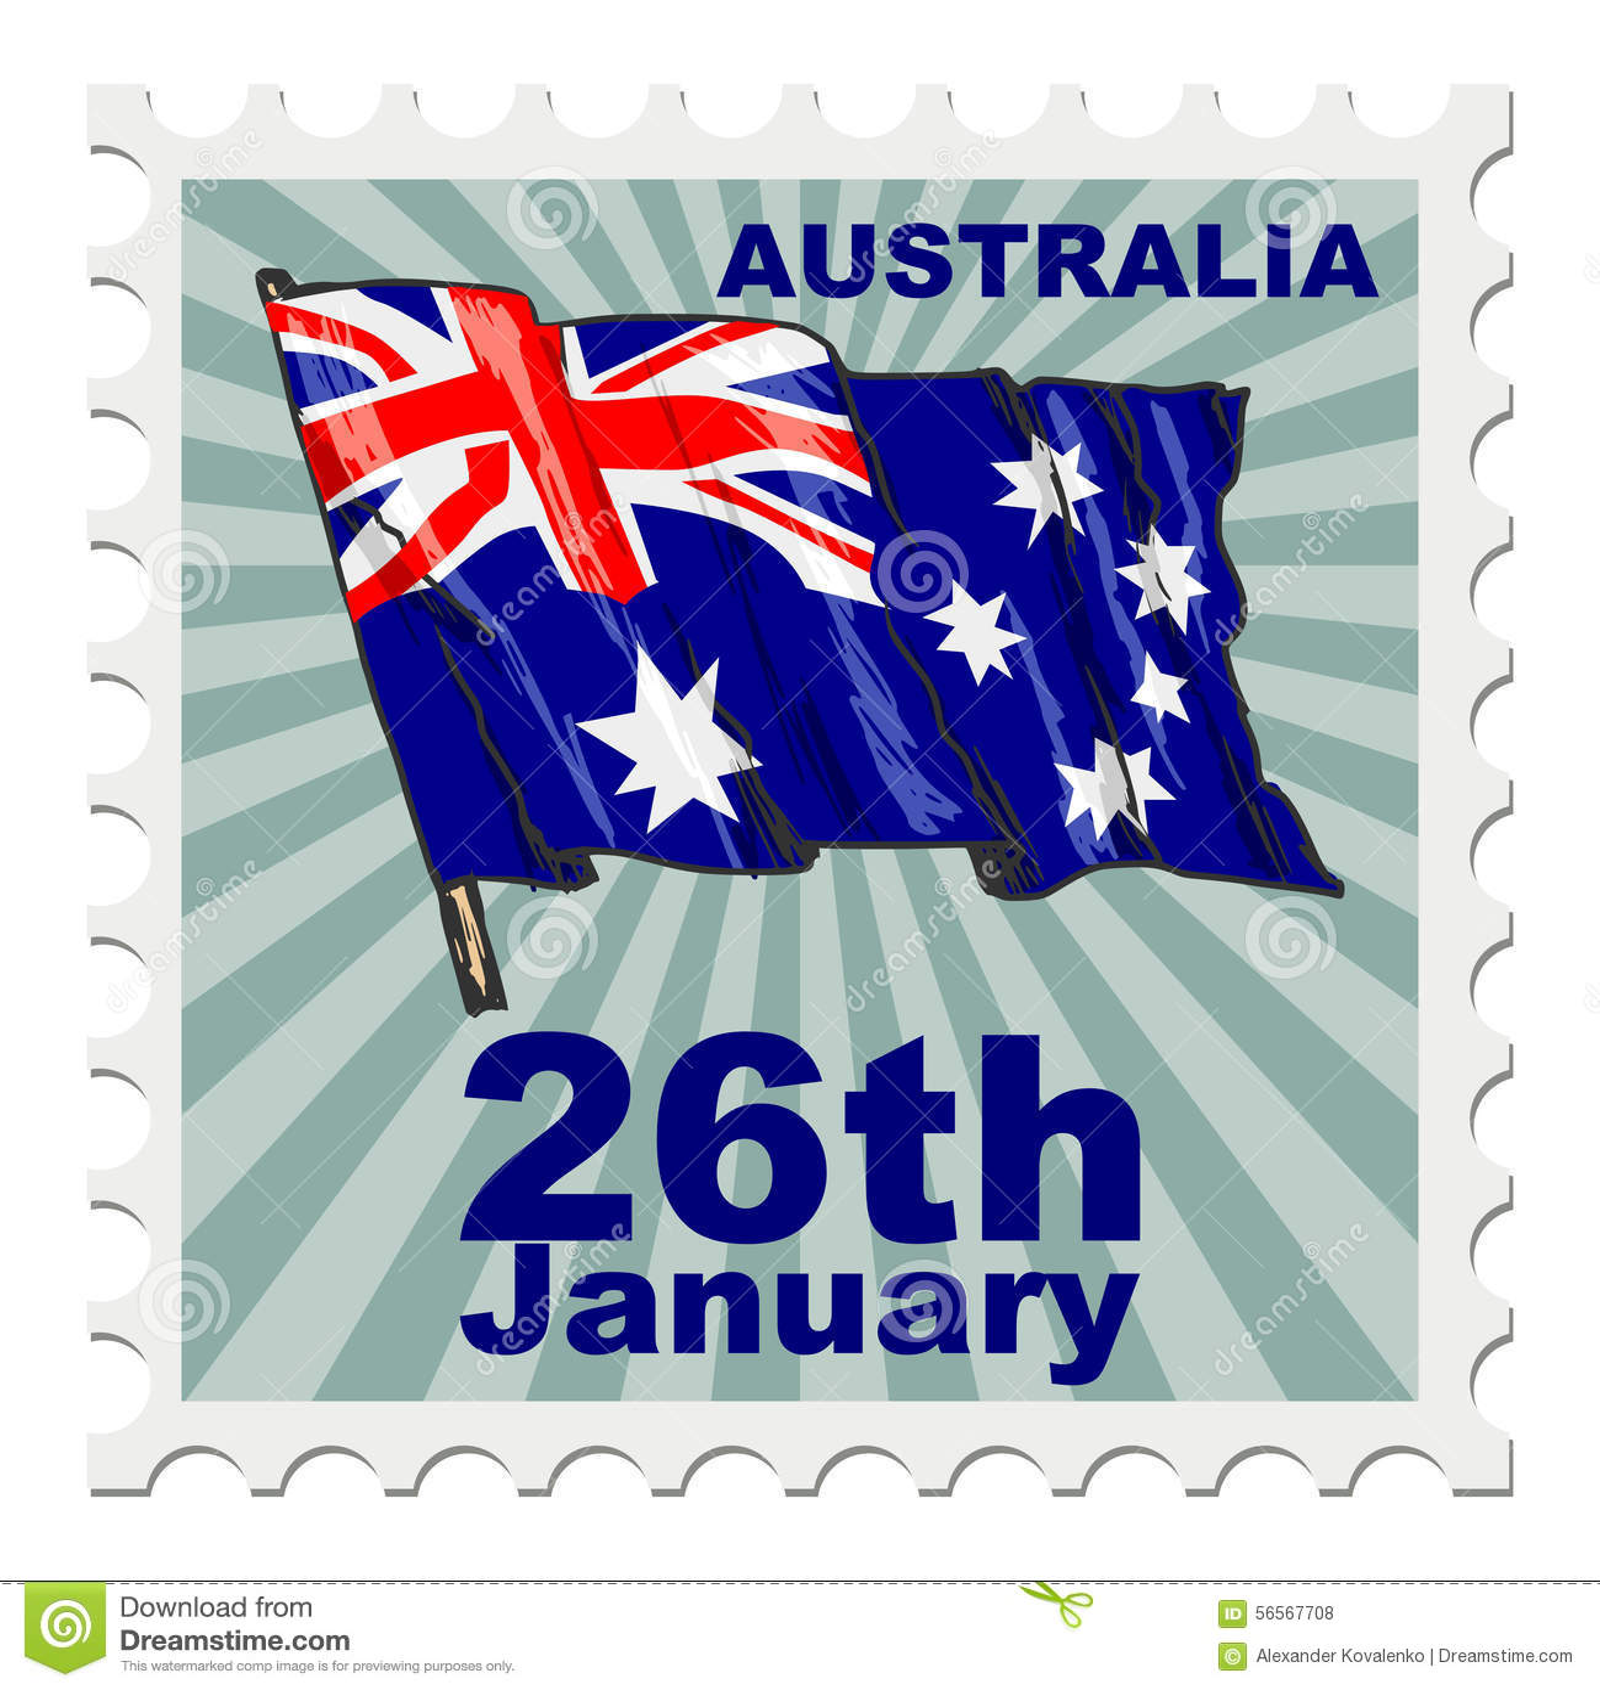 National Day Of Australia Stock Illustration Image 56567708